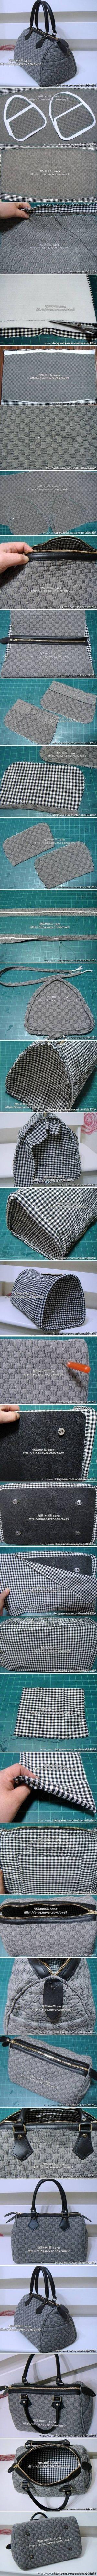 DIY Nice Fashionable Handbag DIY Nice Fashionable Handbag by diyforever